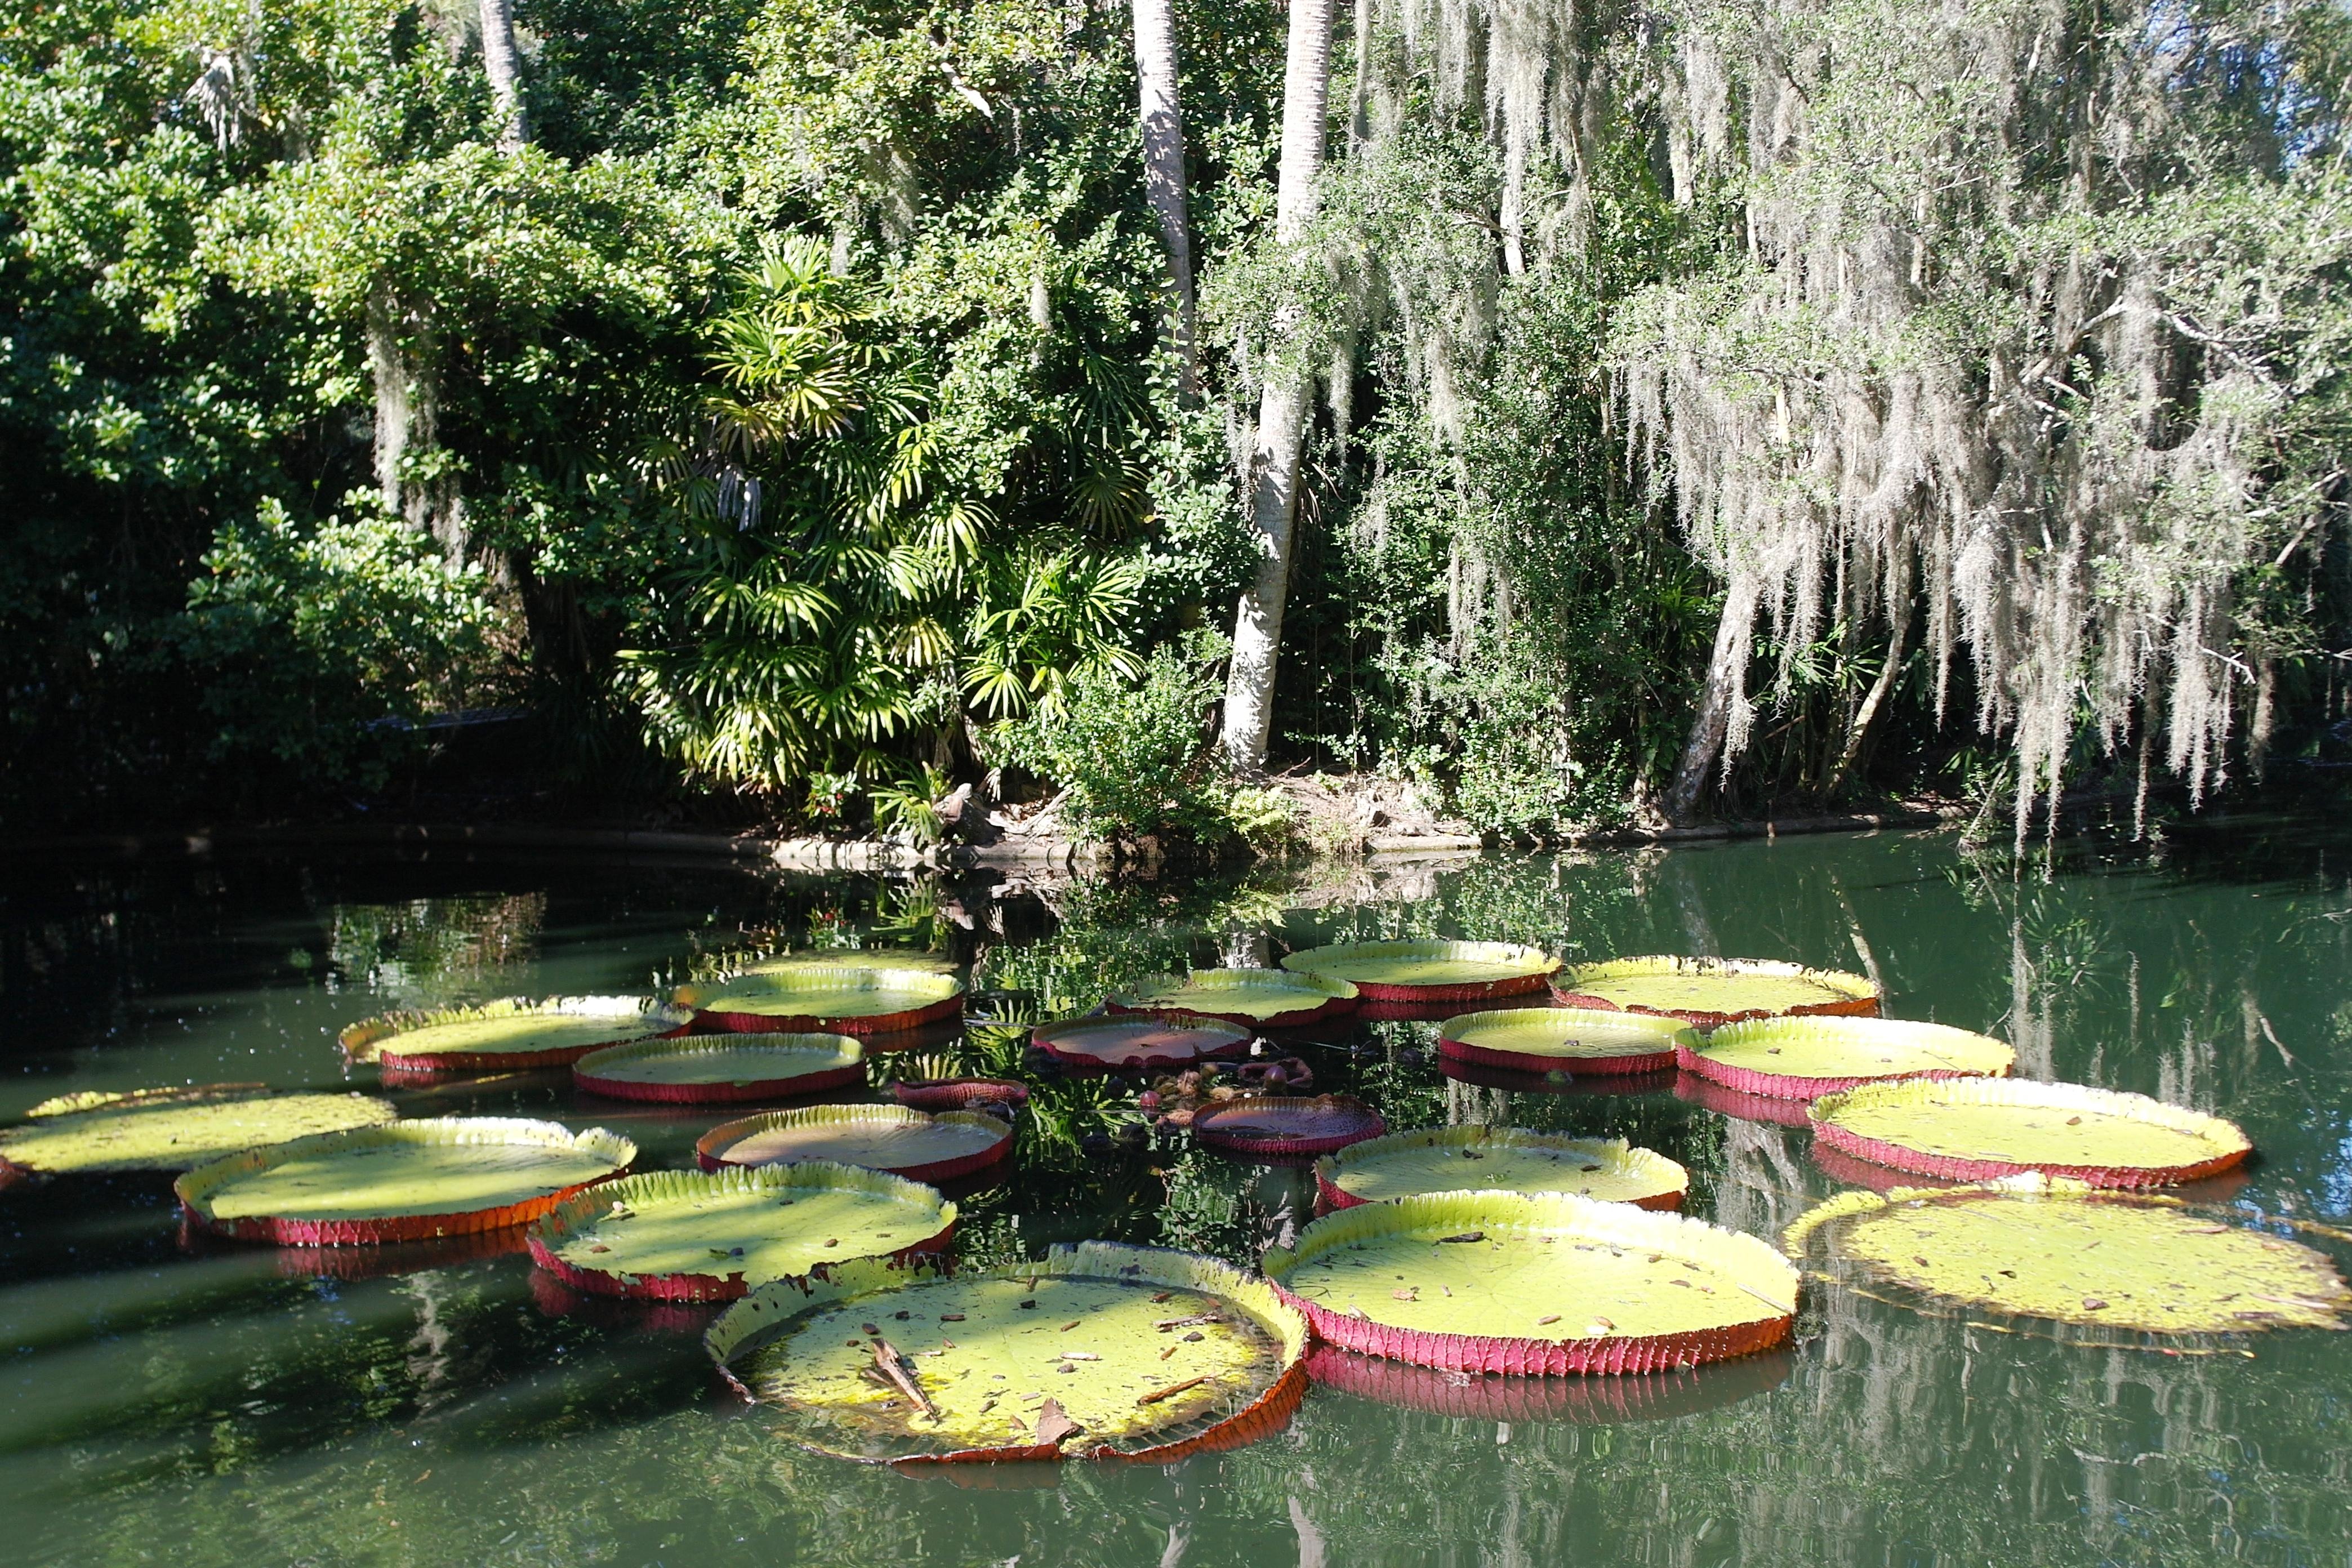 Bok Tower Showcases Floridas Lush Landscapes